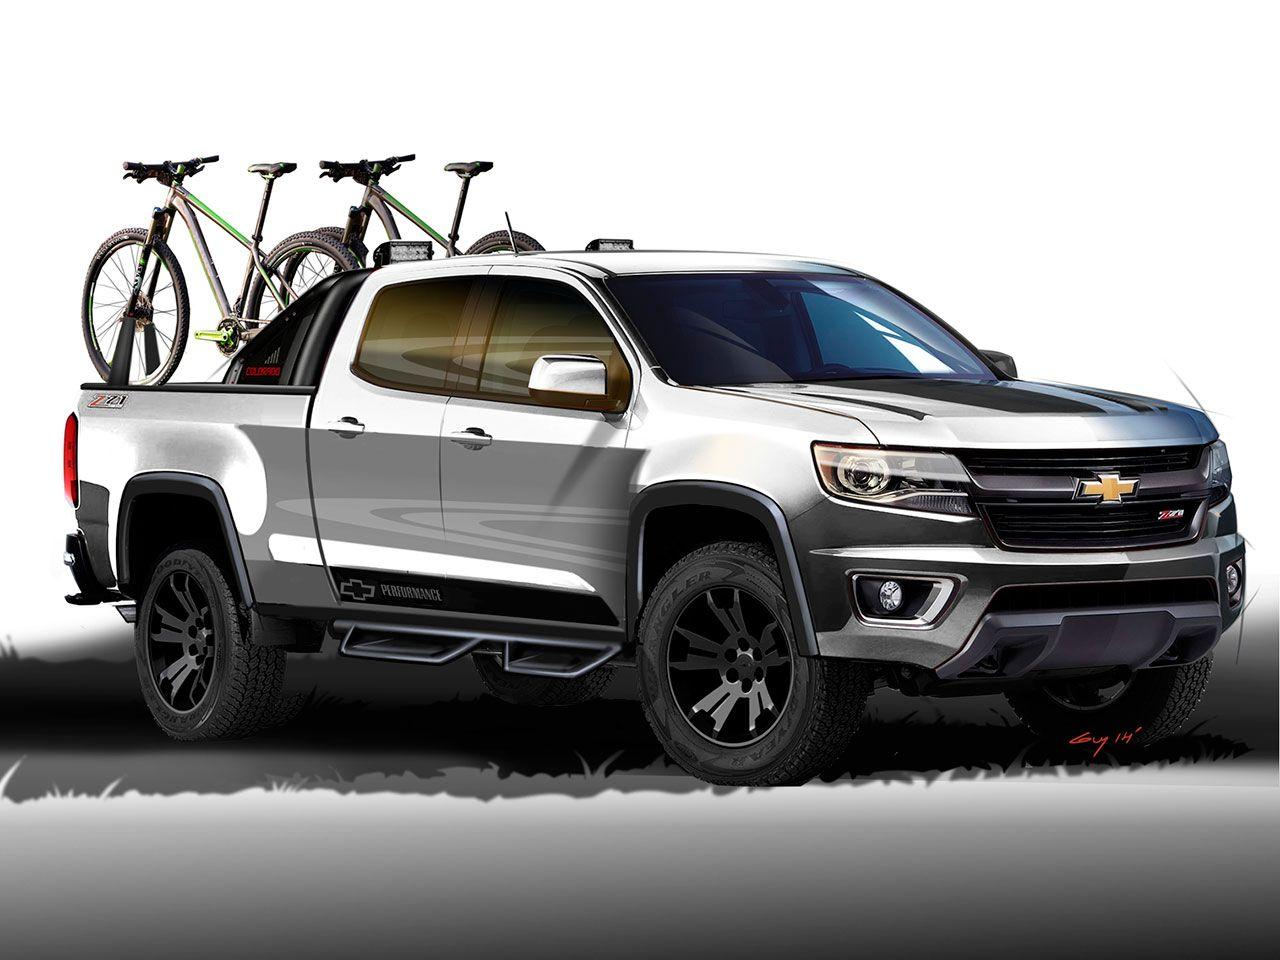 2014 Chevrolet Colorado Sport Concept Design Sketch Chevrolet